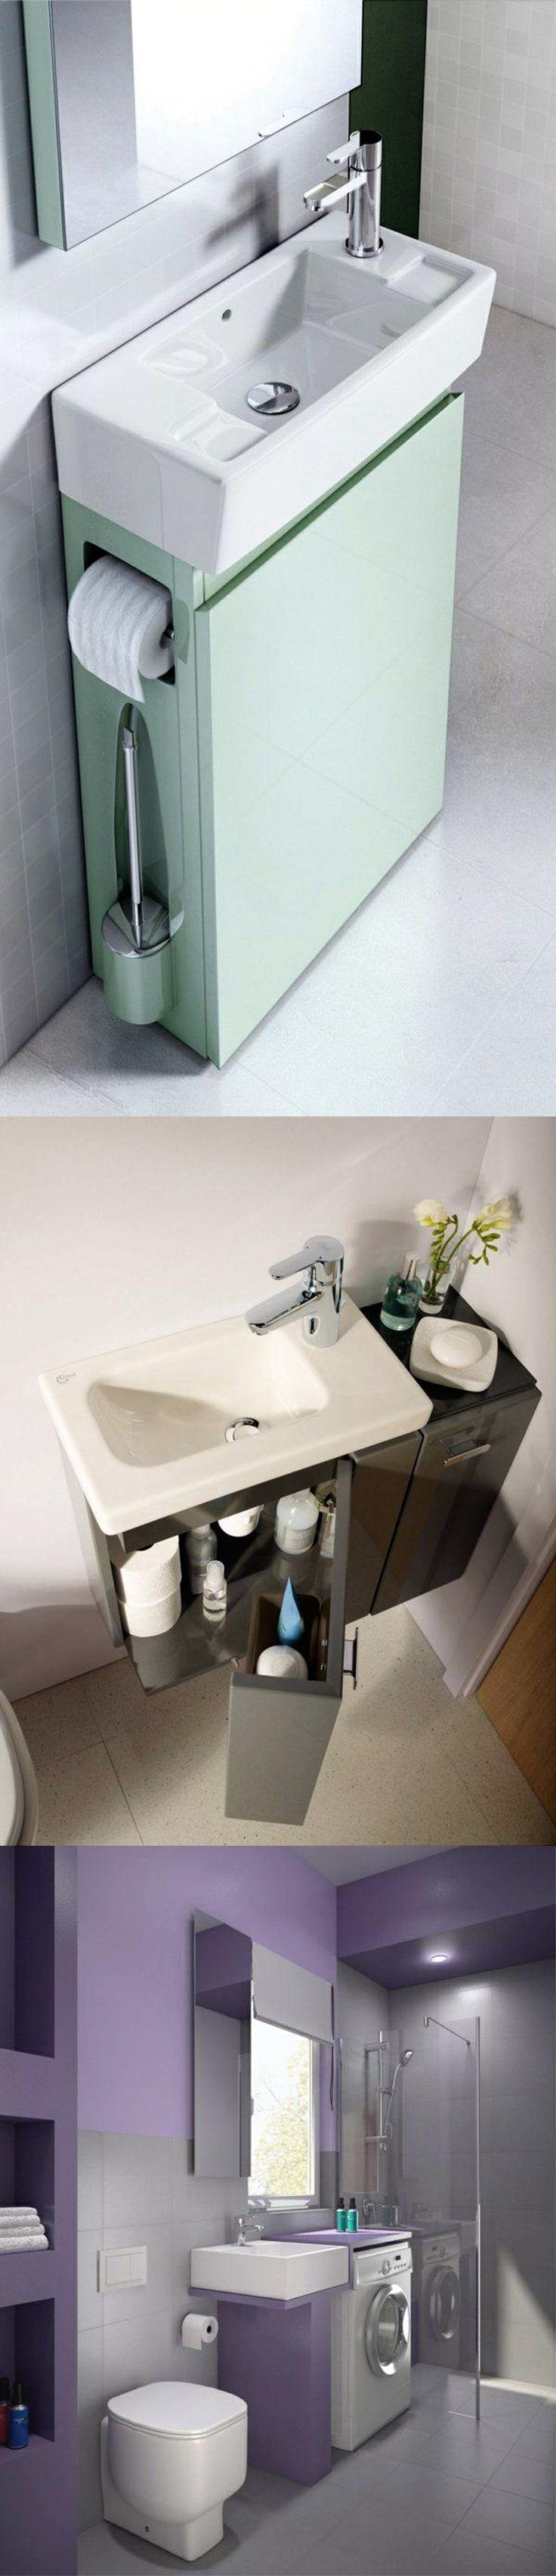 Badideen für kleine räume small bathroom ideas spacesaving modern bathroom furniture